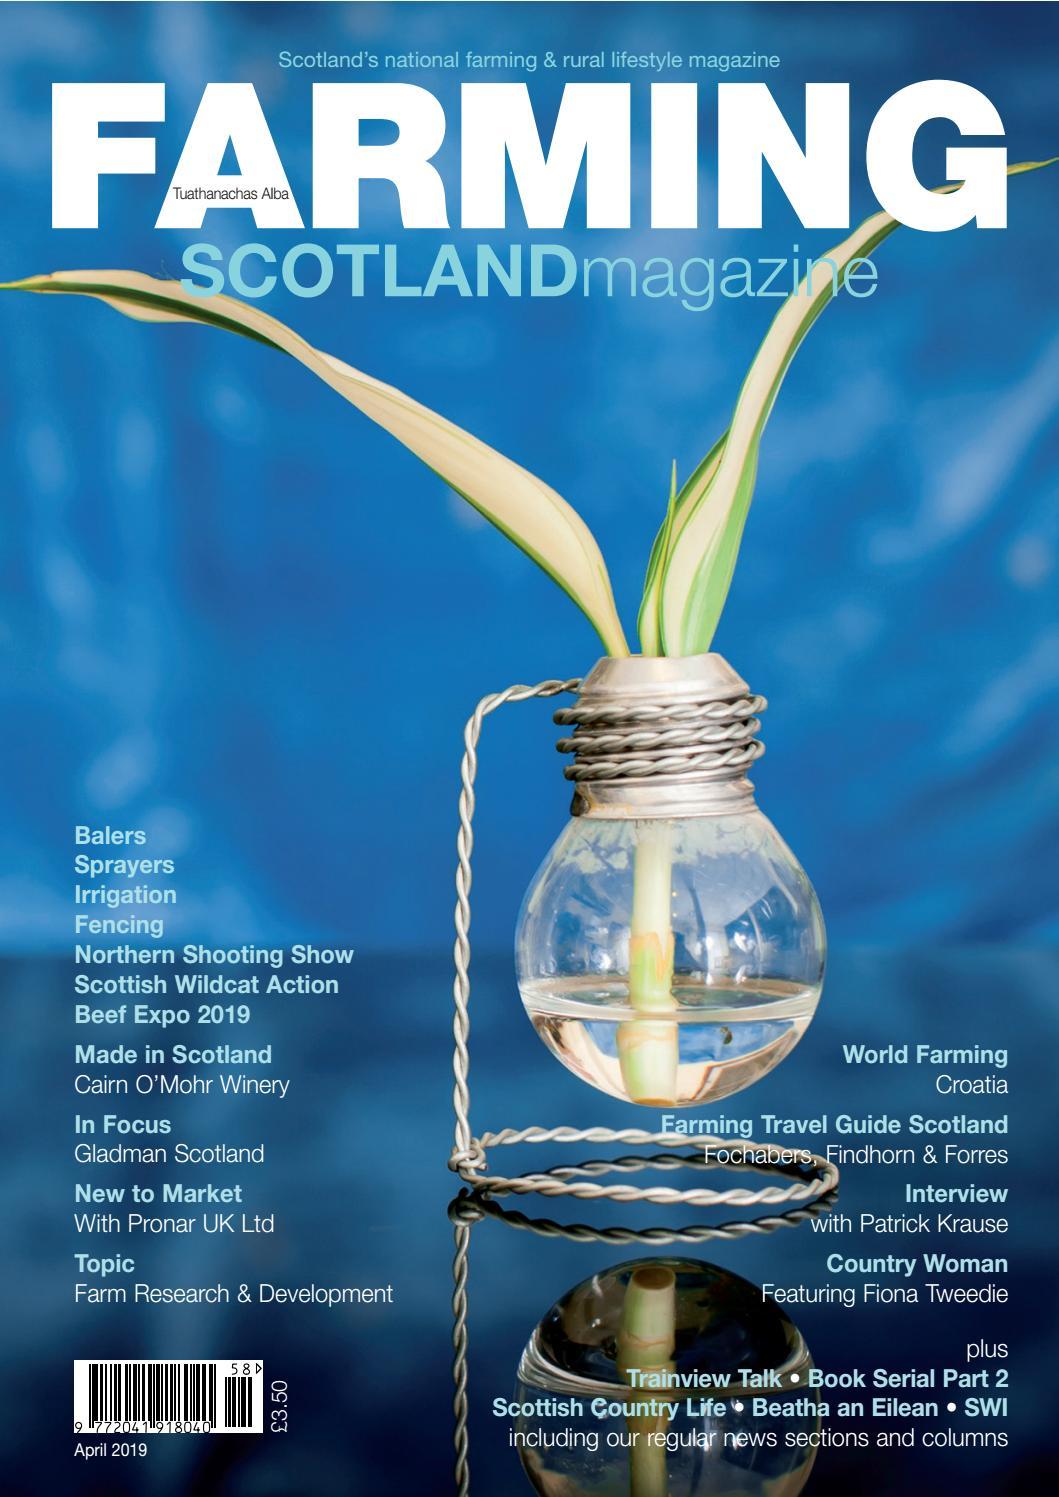 Farming Scotland Magazine (March - April 2019) by Athole